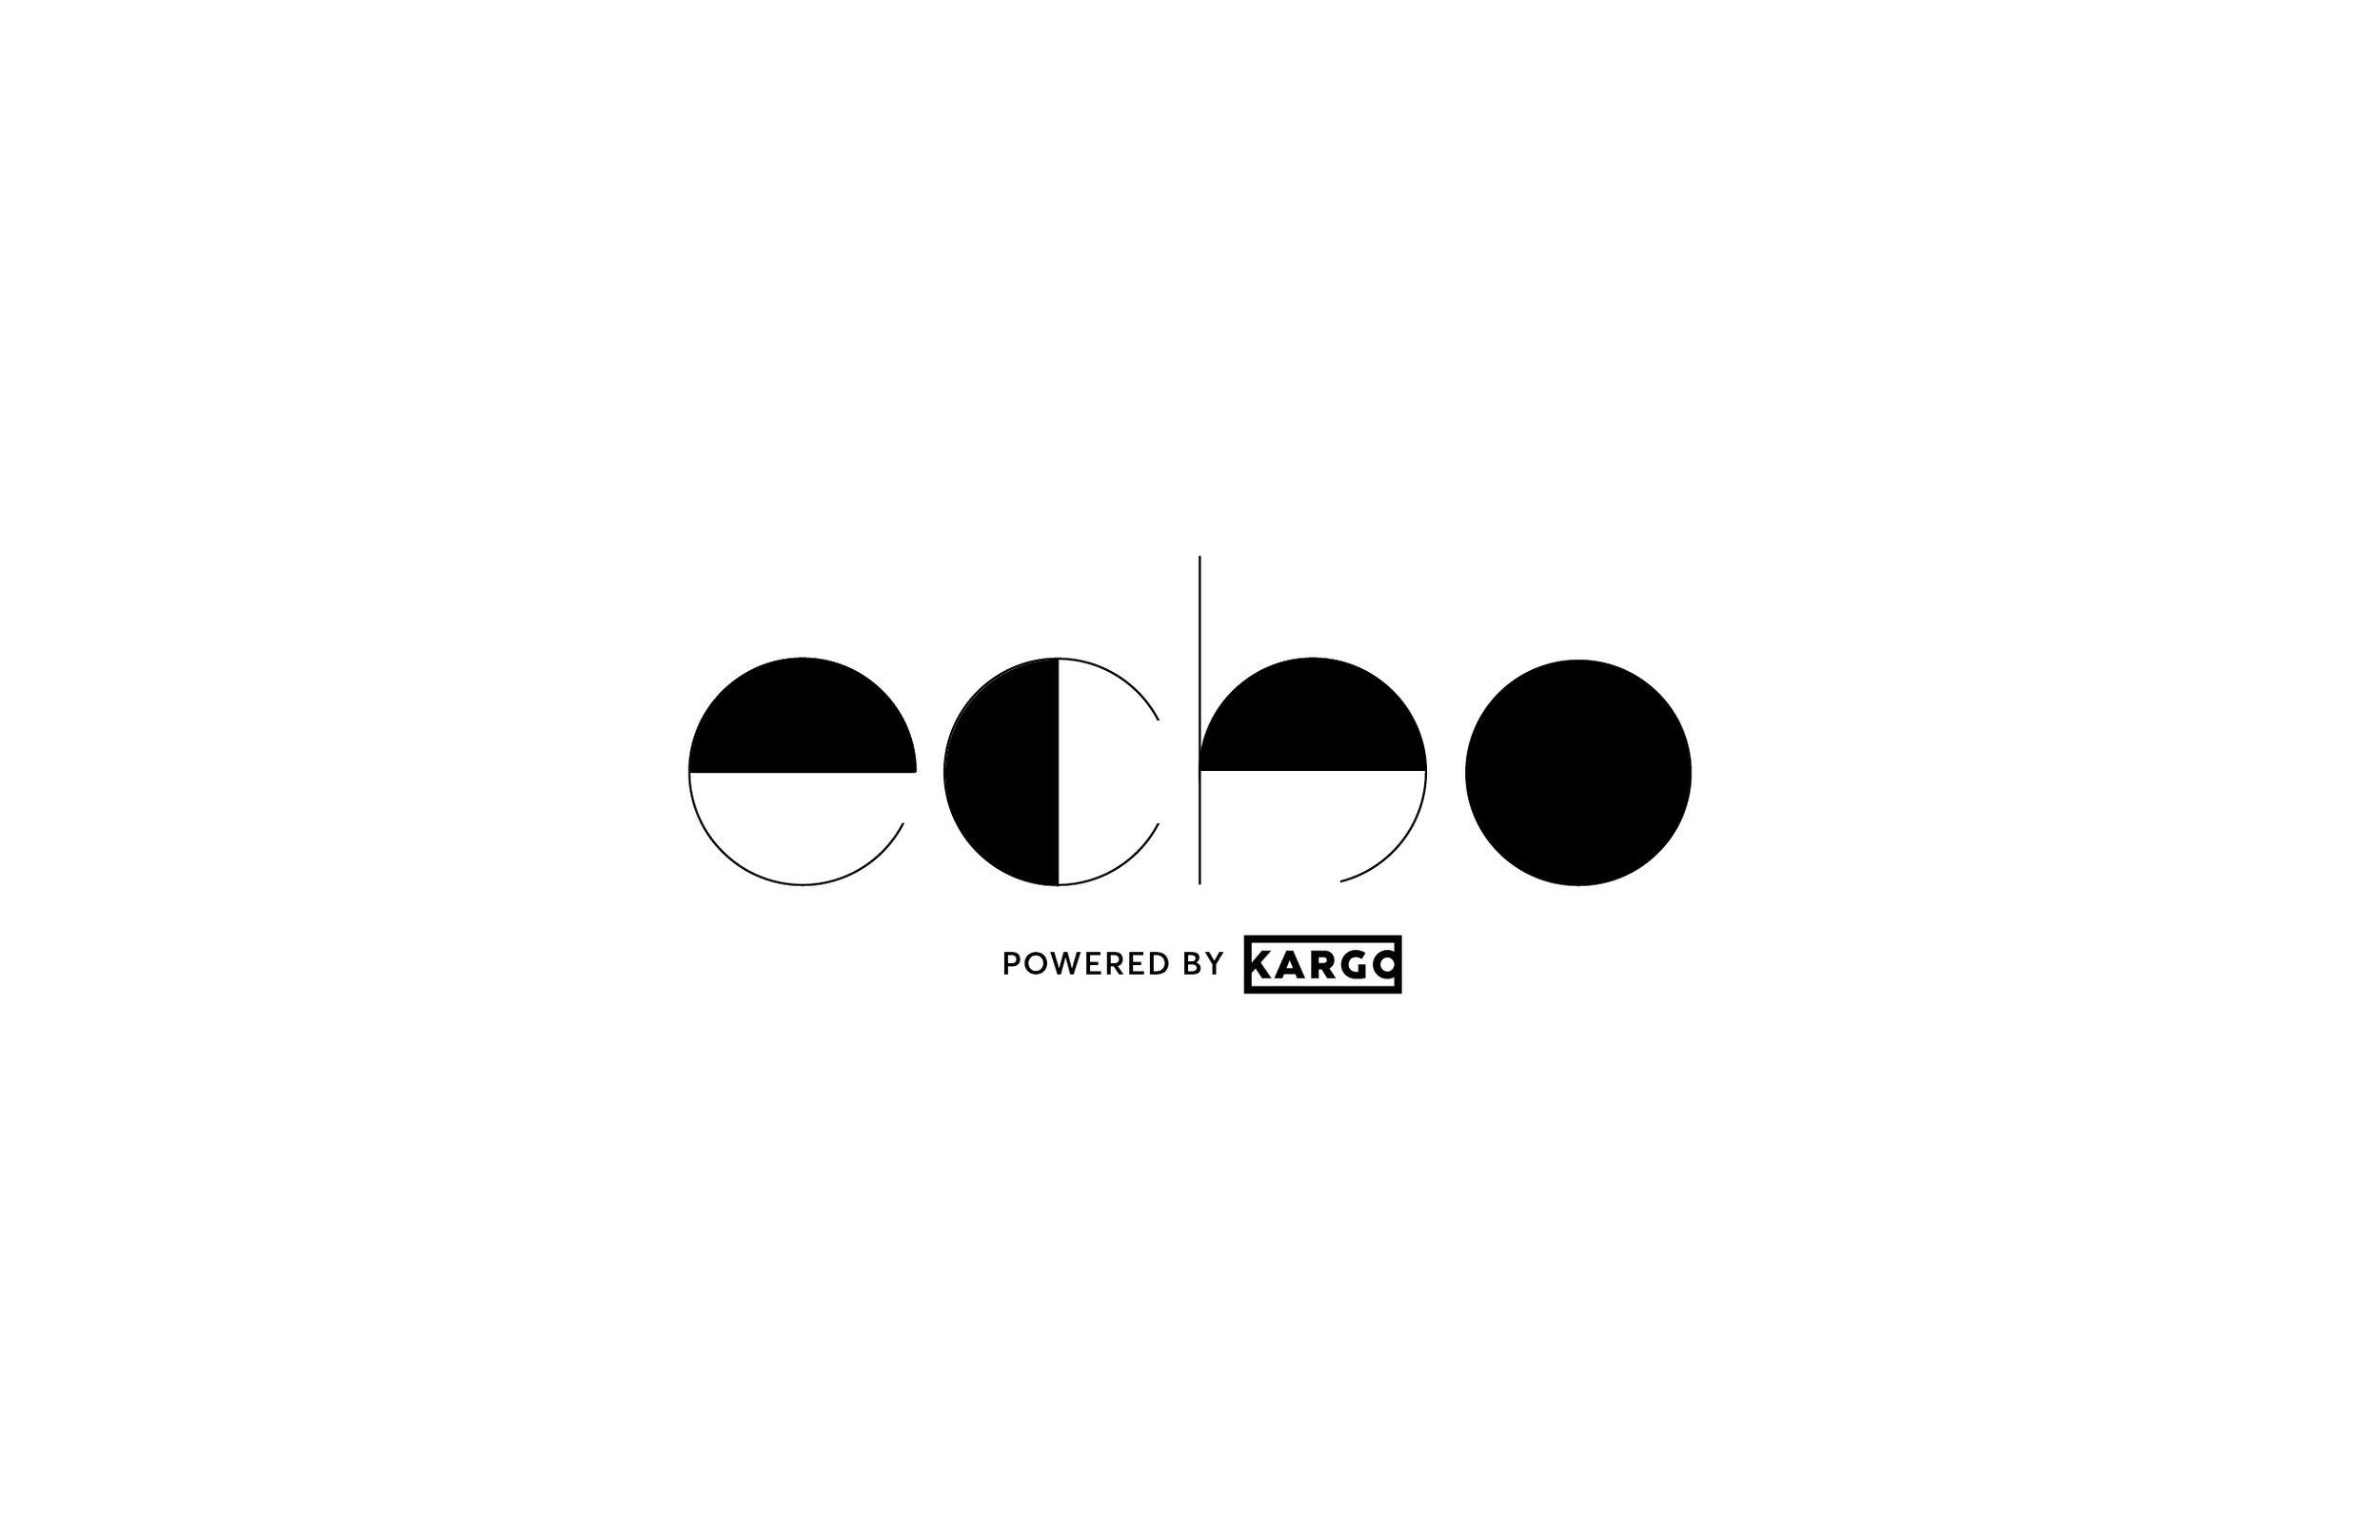 echo logos4.jpg